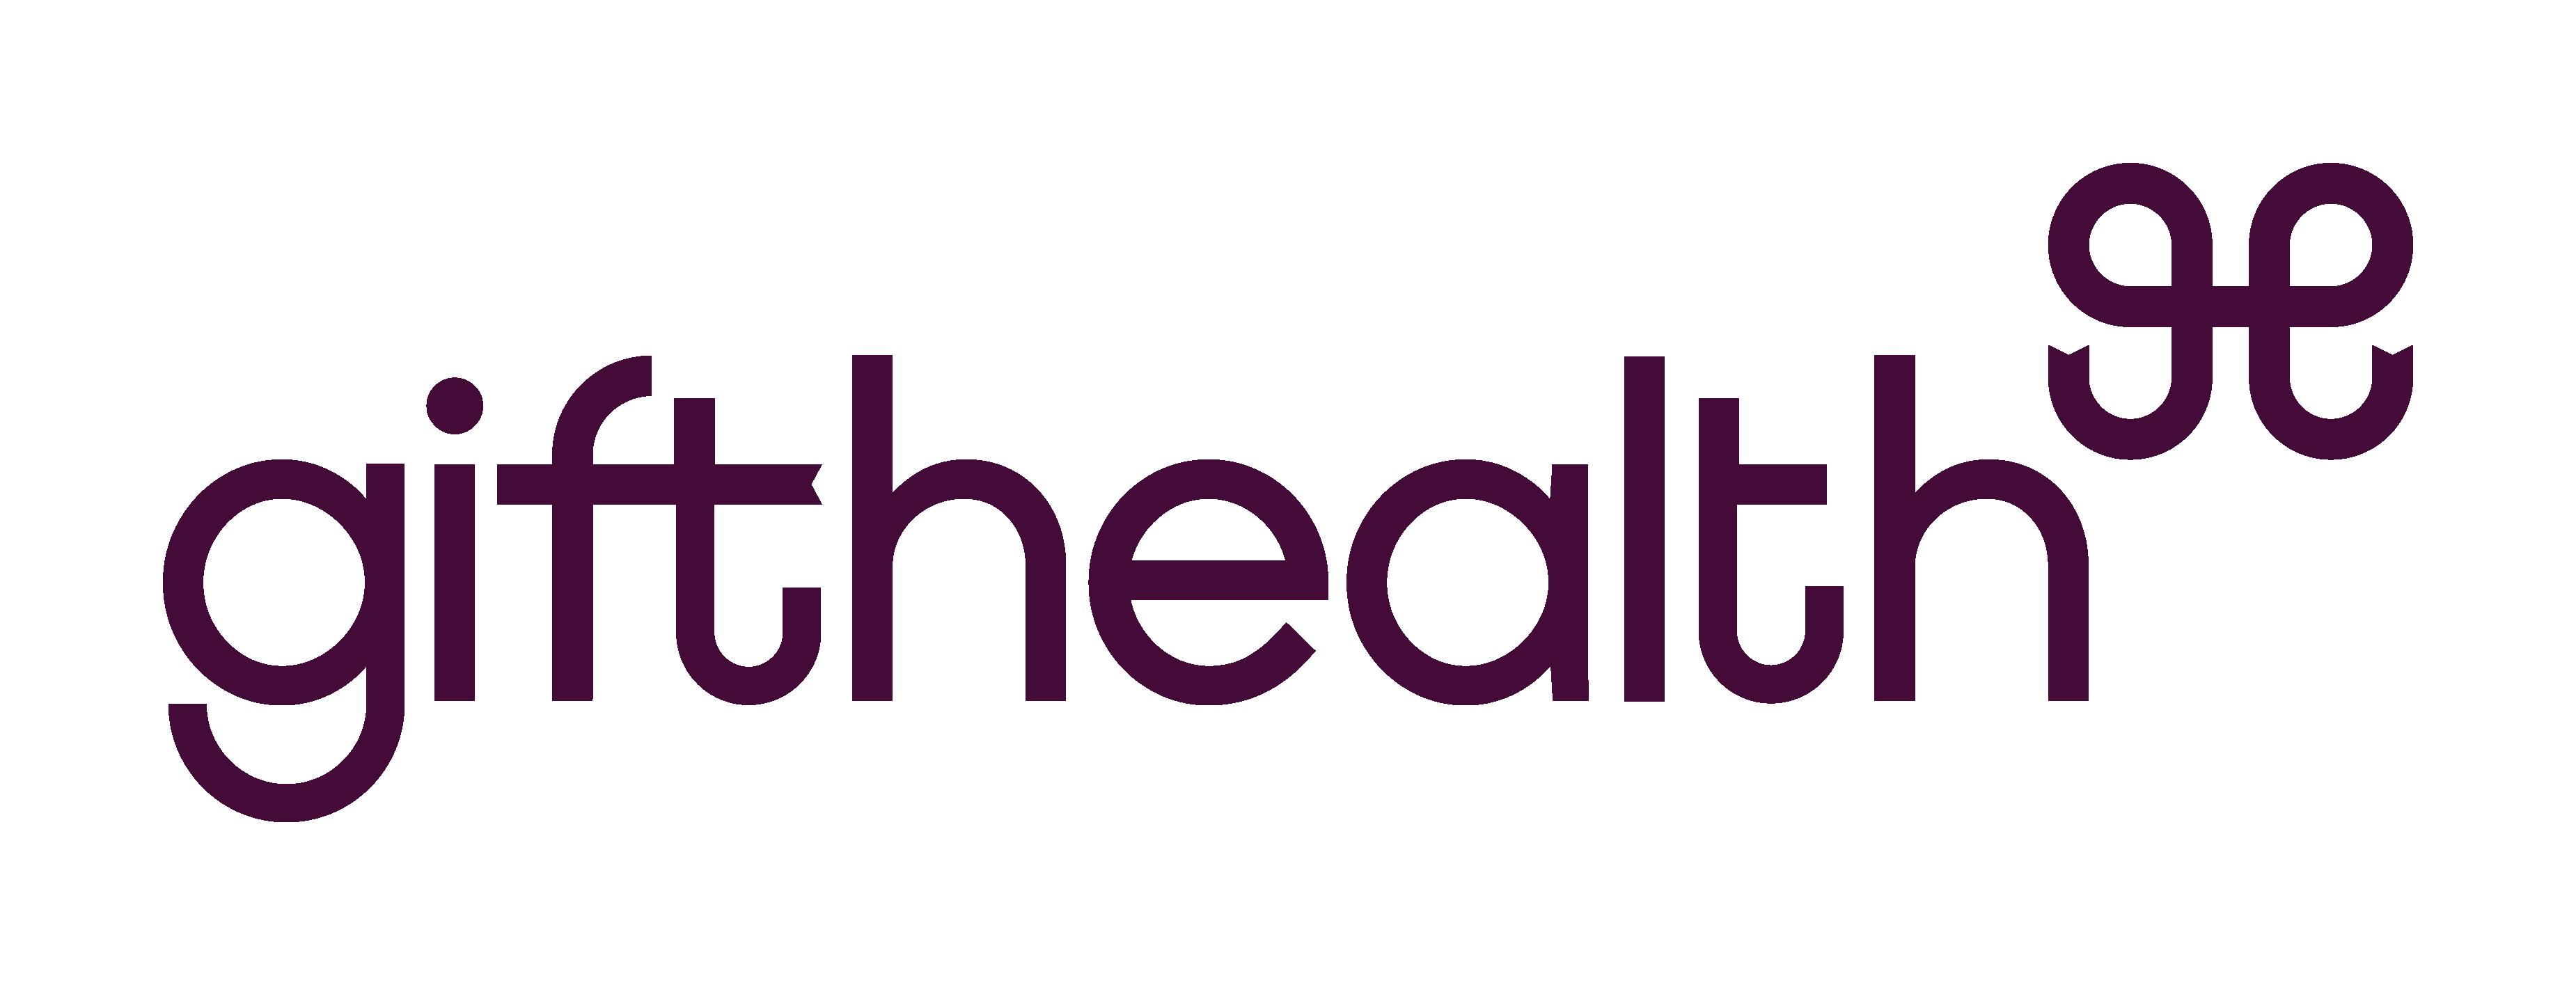 Gifthealth